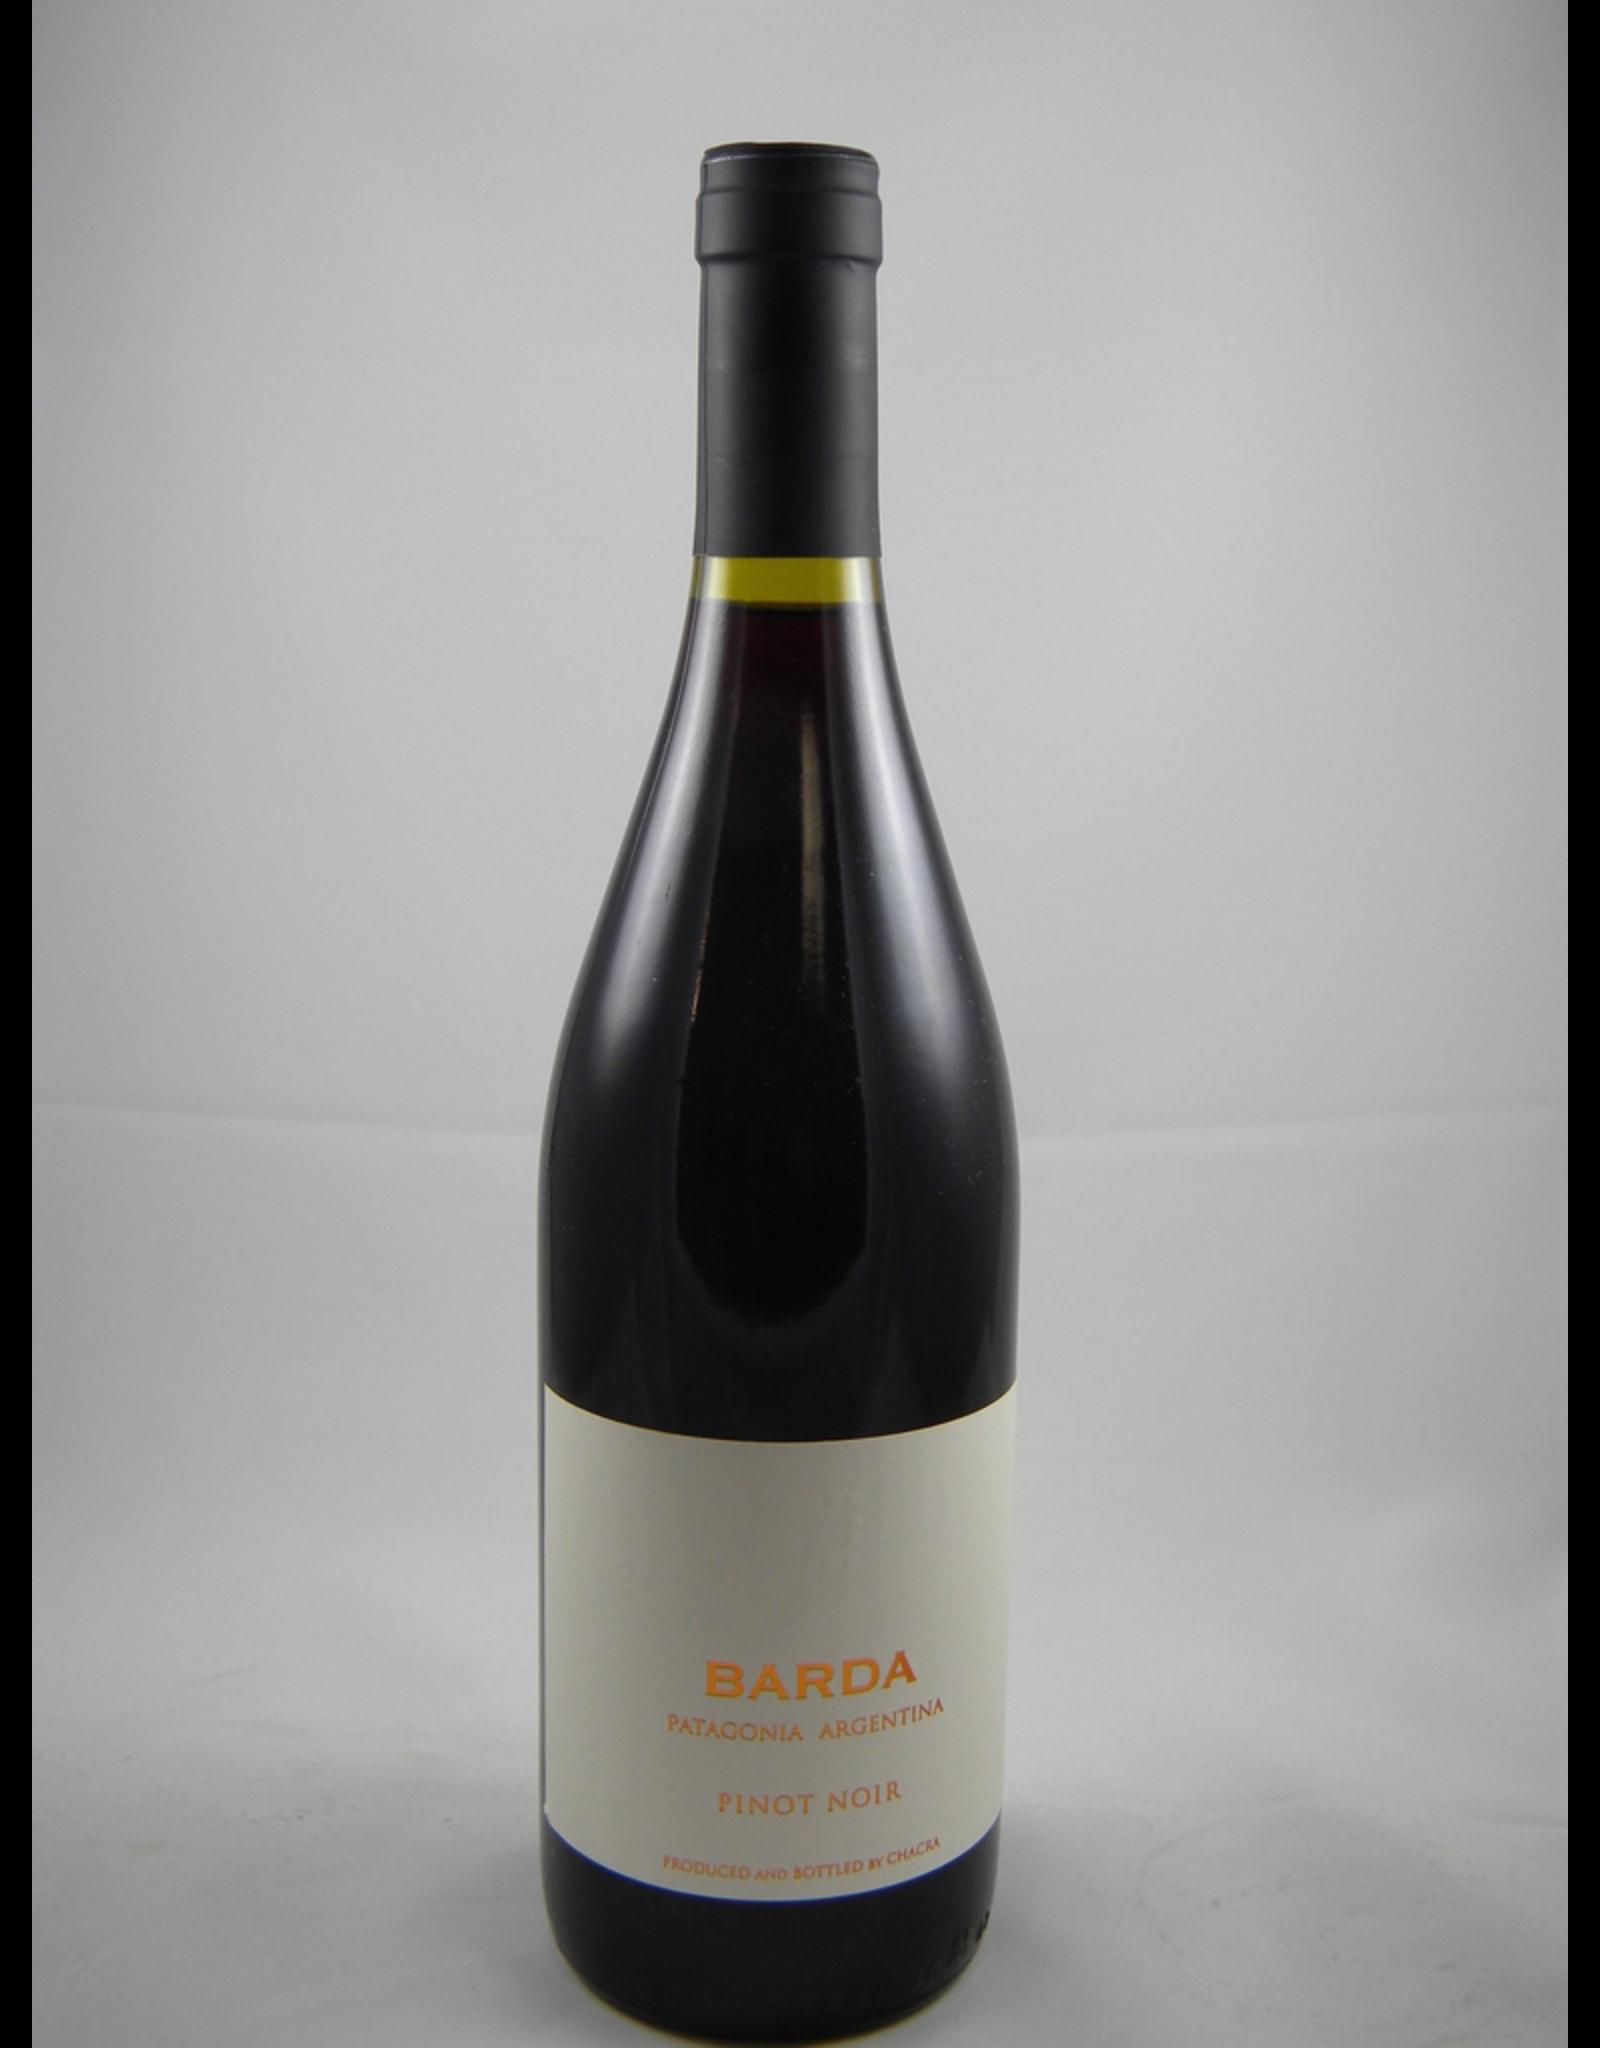 Chacra Chacra Pinot Noir Patagonia Barda 2019